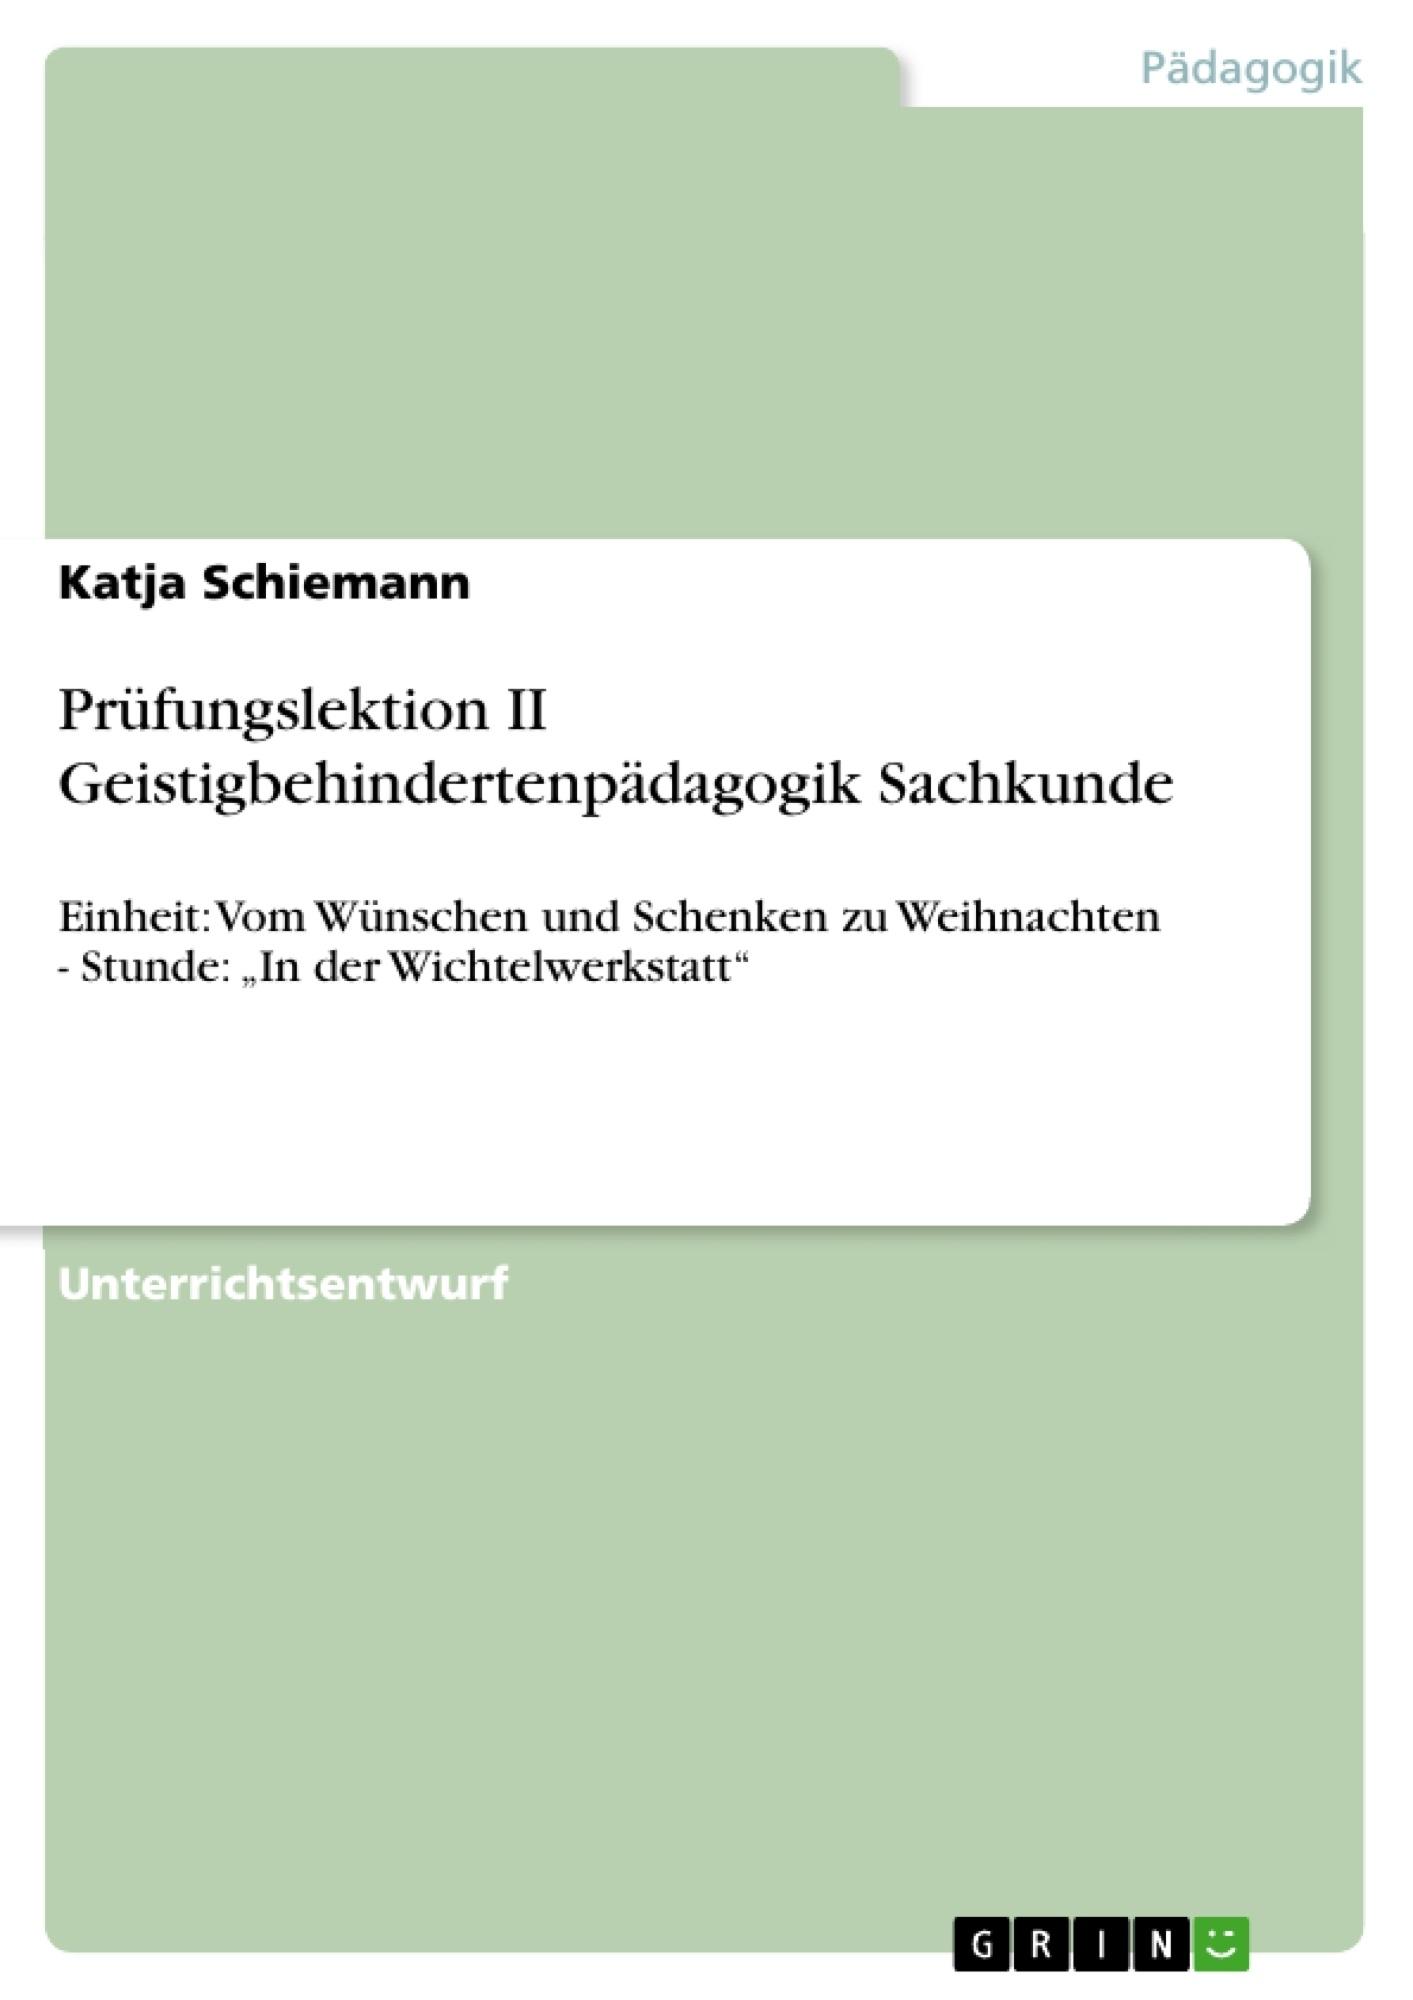 Titel: Prüfungslektion II Geistigbehindertenpädagogik Sachkunde